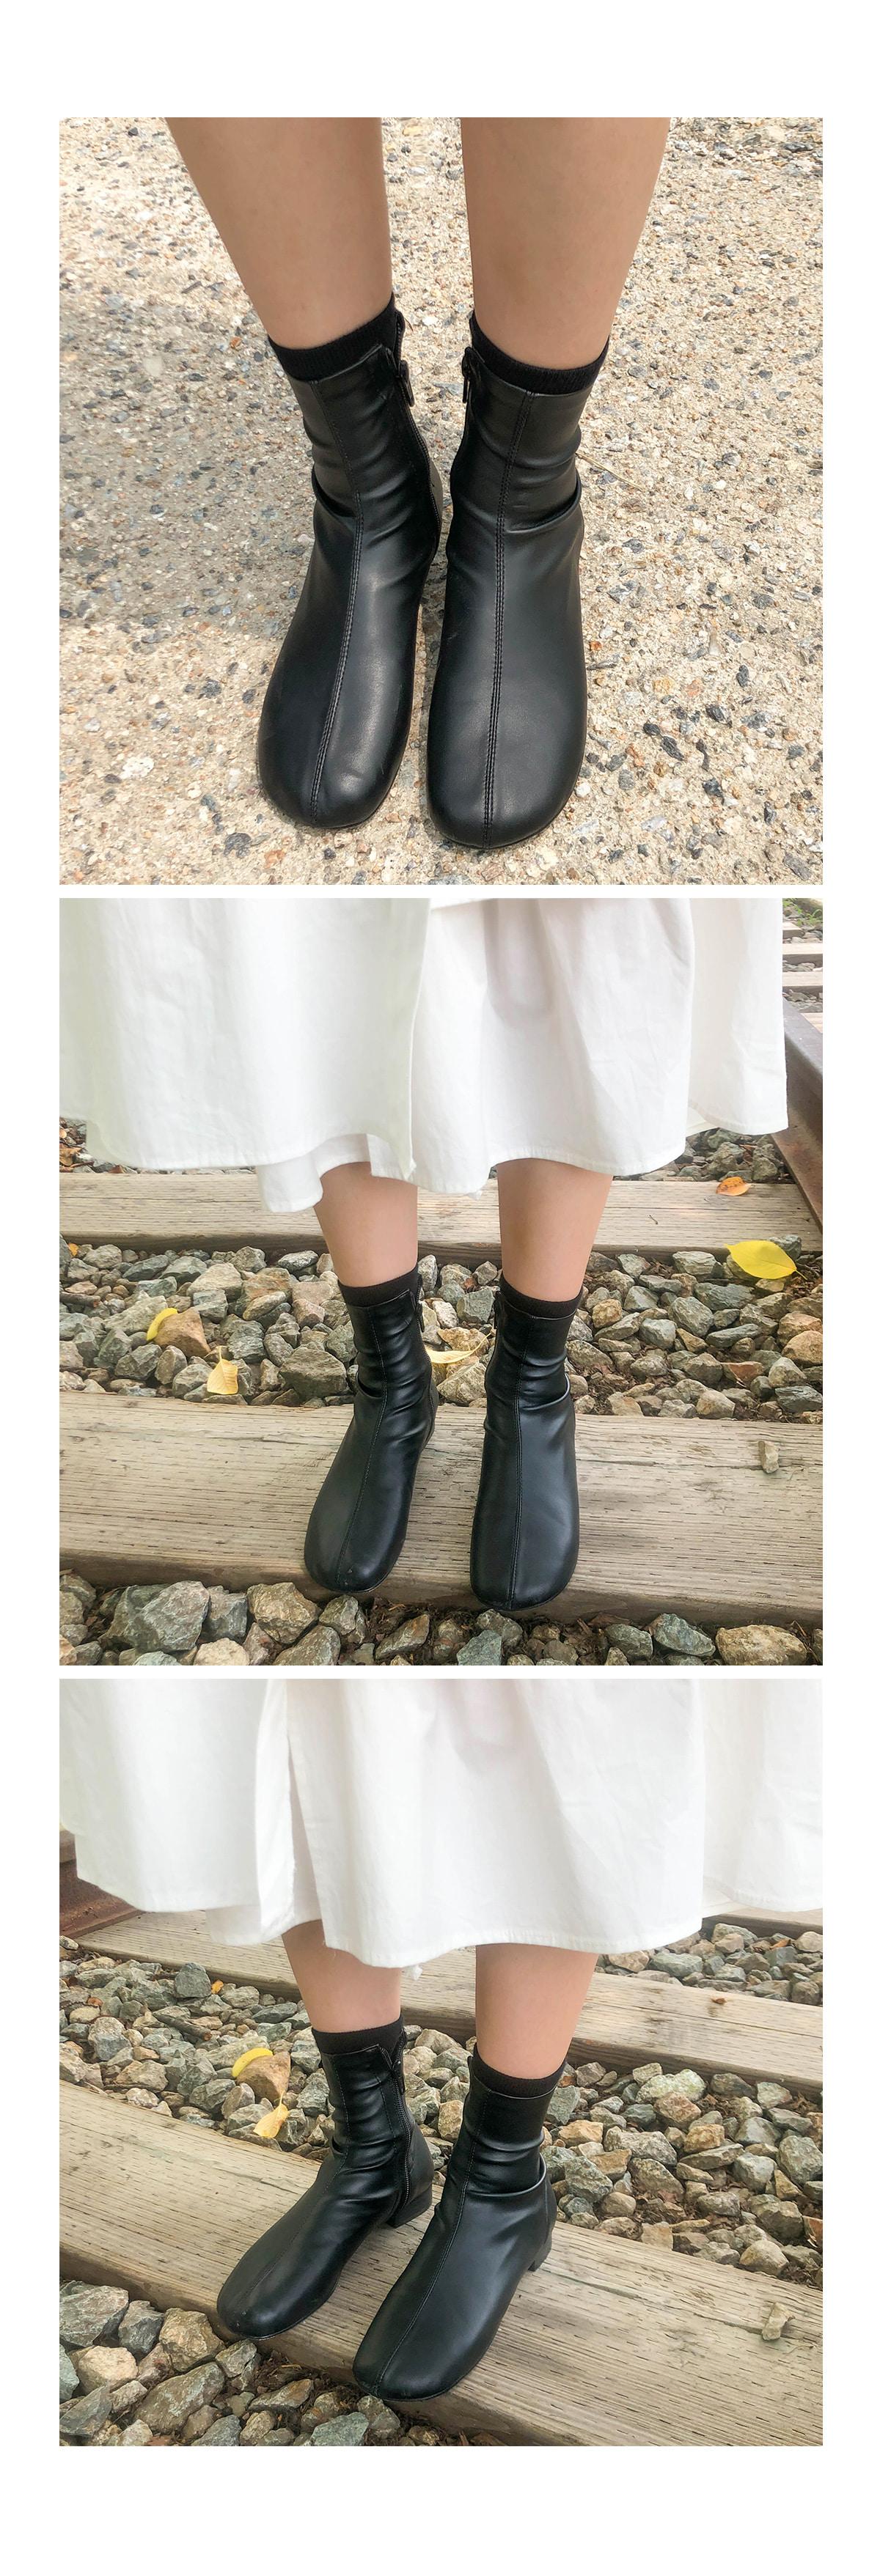 Round Vovian Angle Boots